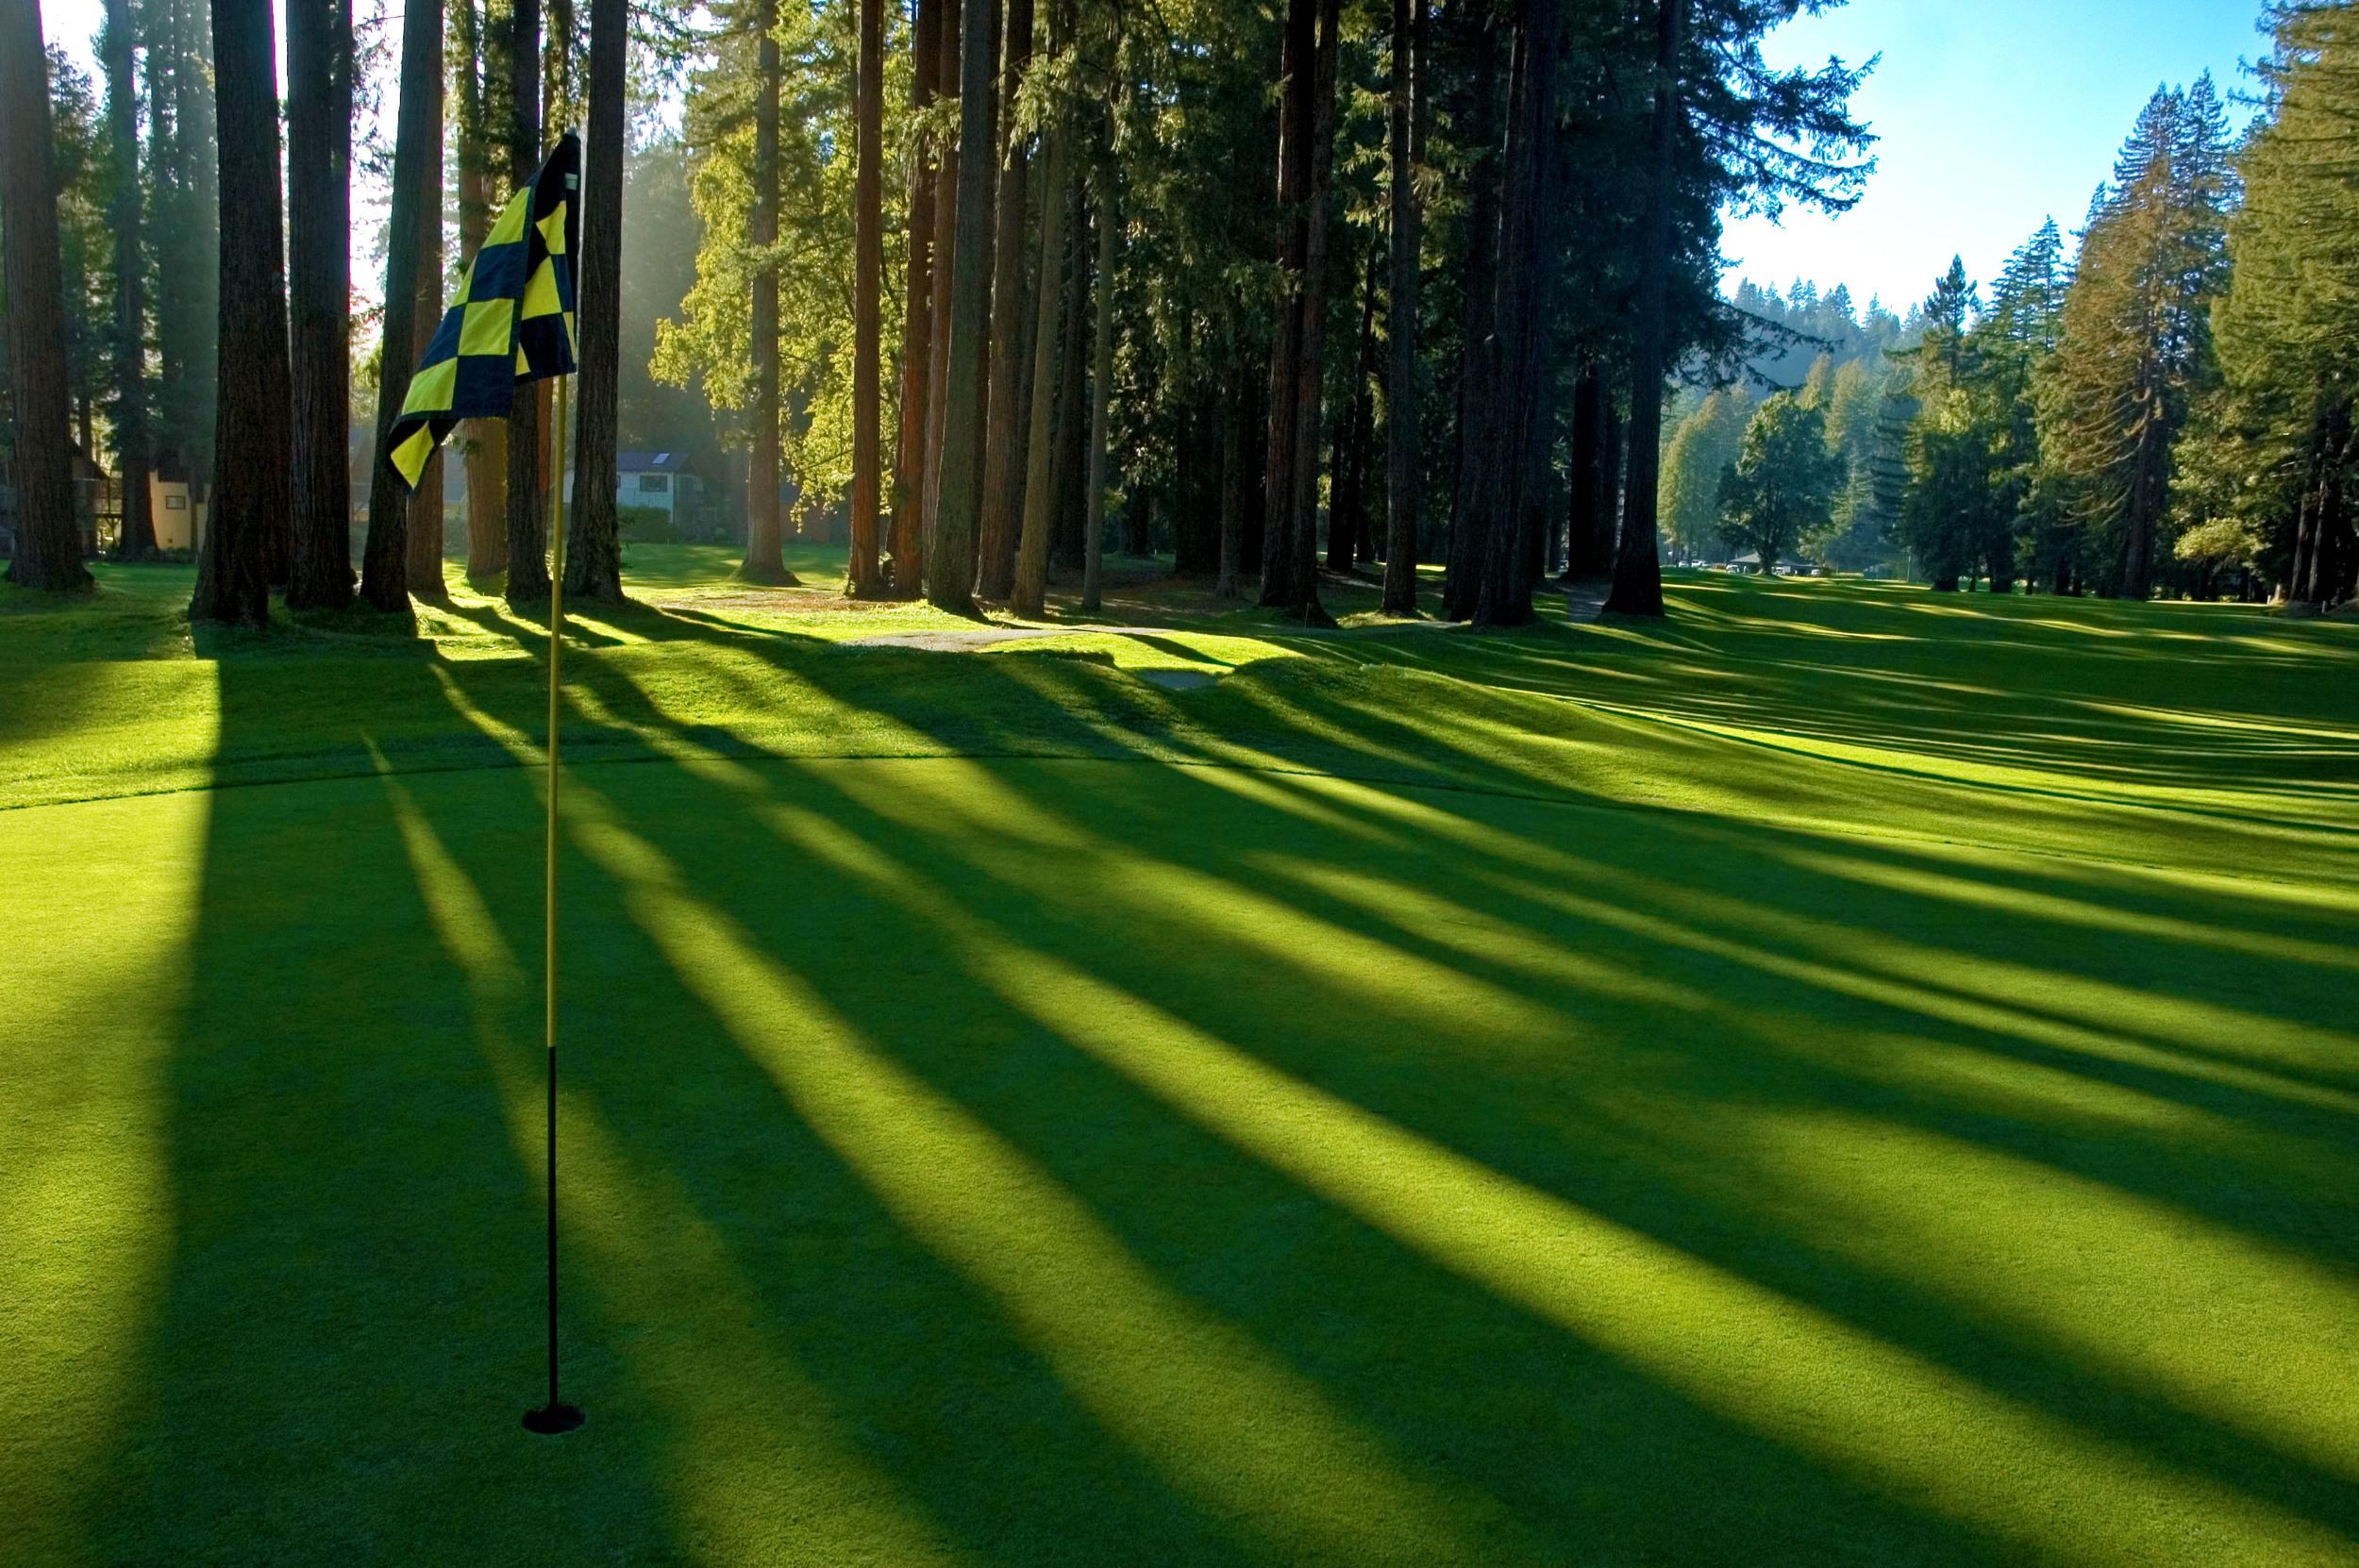 Giant Redwoods cast long shadows down the entire 381-yard, par 4, 7th fairway. © Robert Kaufman